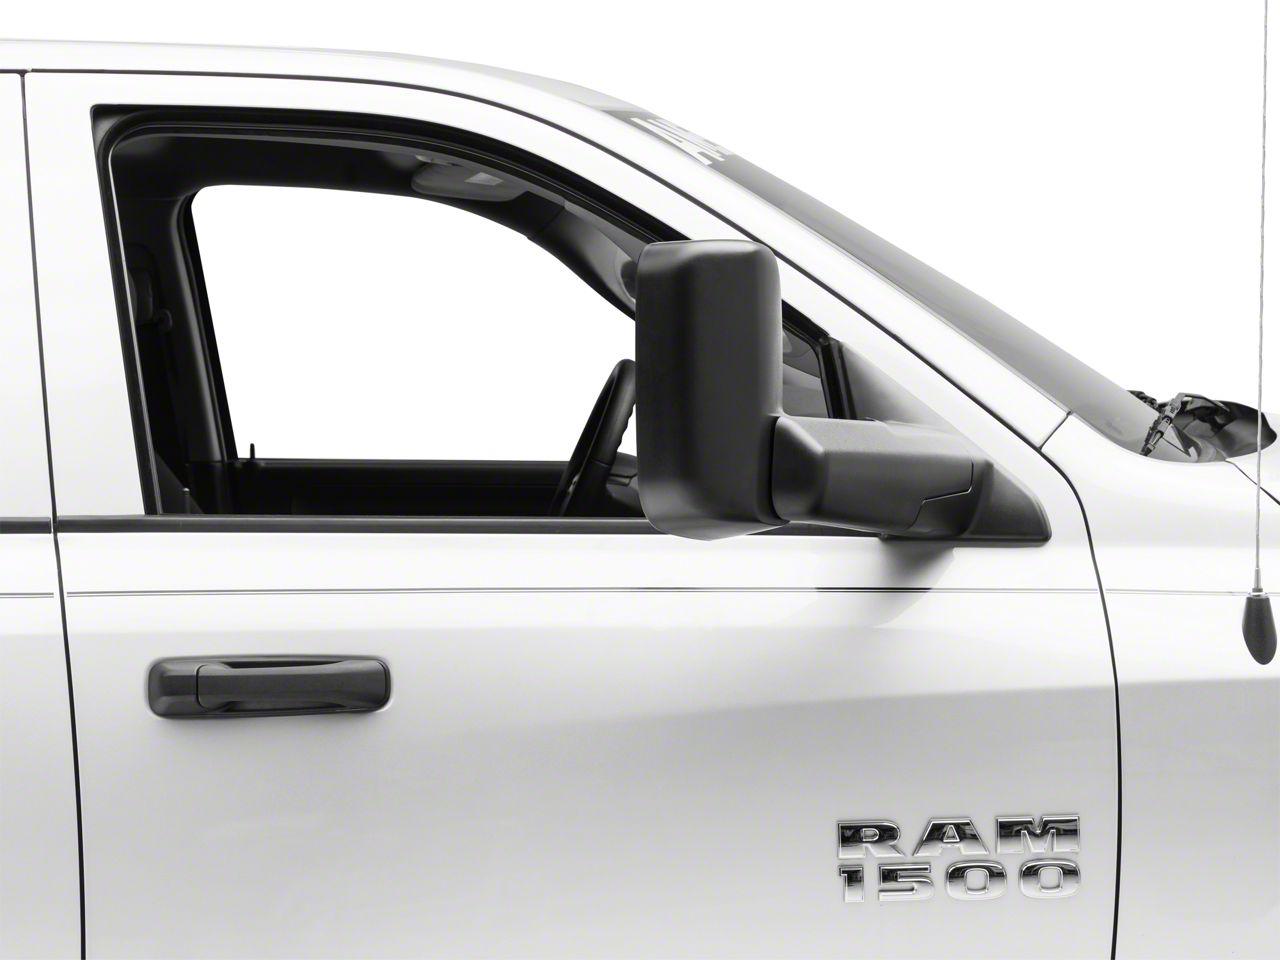 OPR Manual Foldaway Flip-Up Towing Mirror w/ Temp Sensor - Textured Black (13-18 RAM 1500)